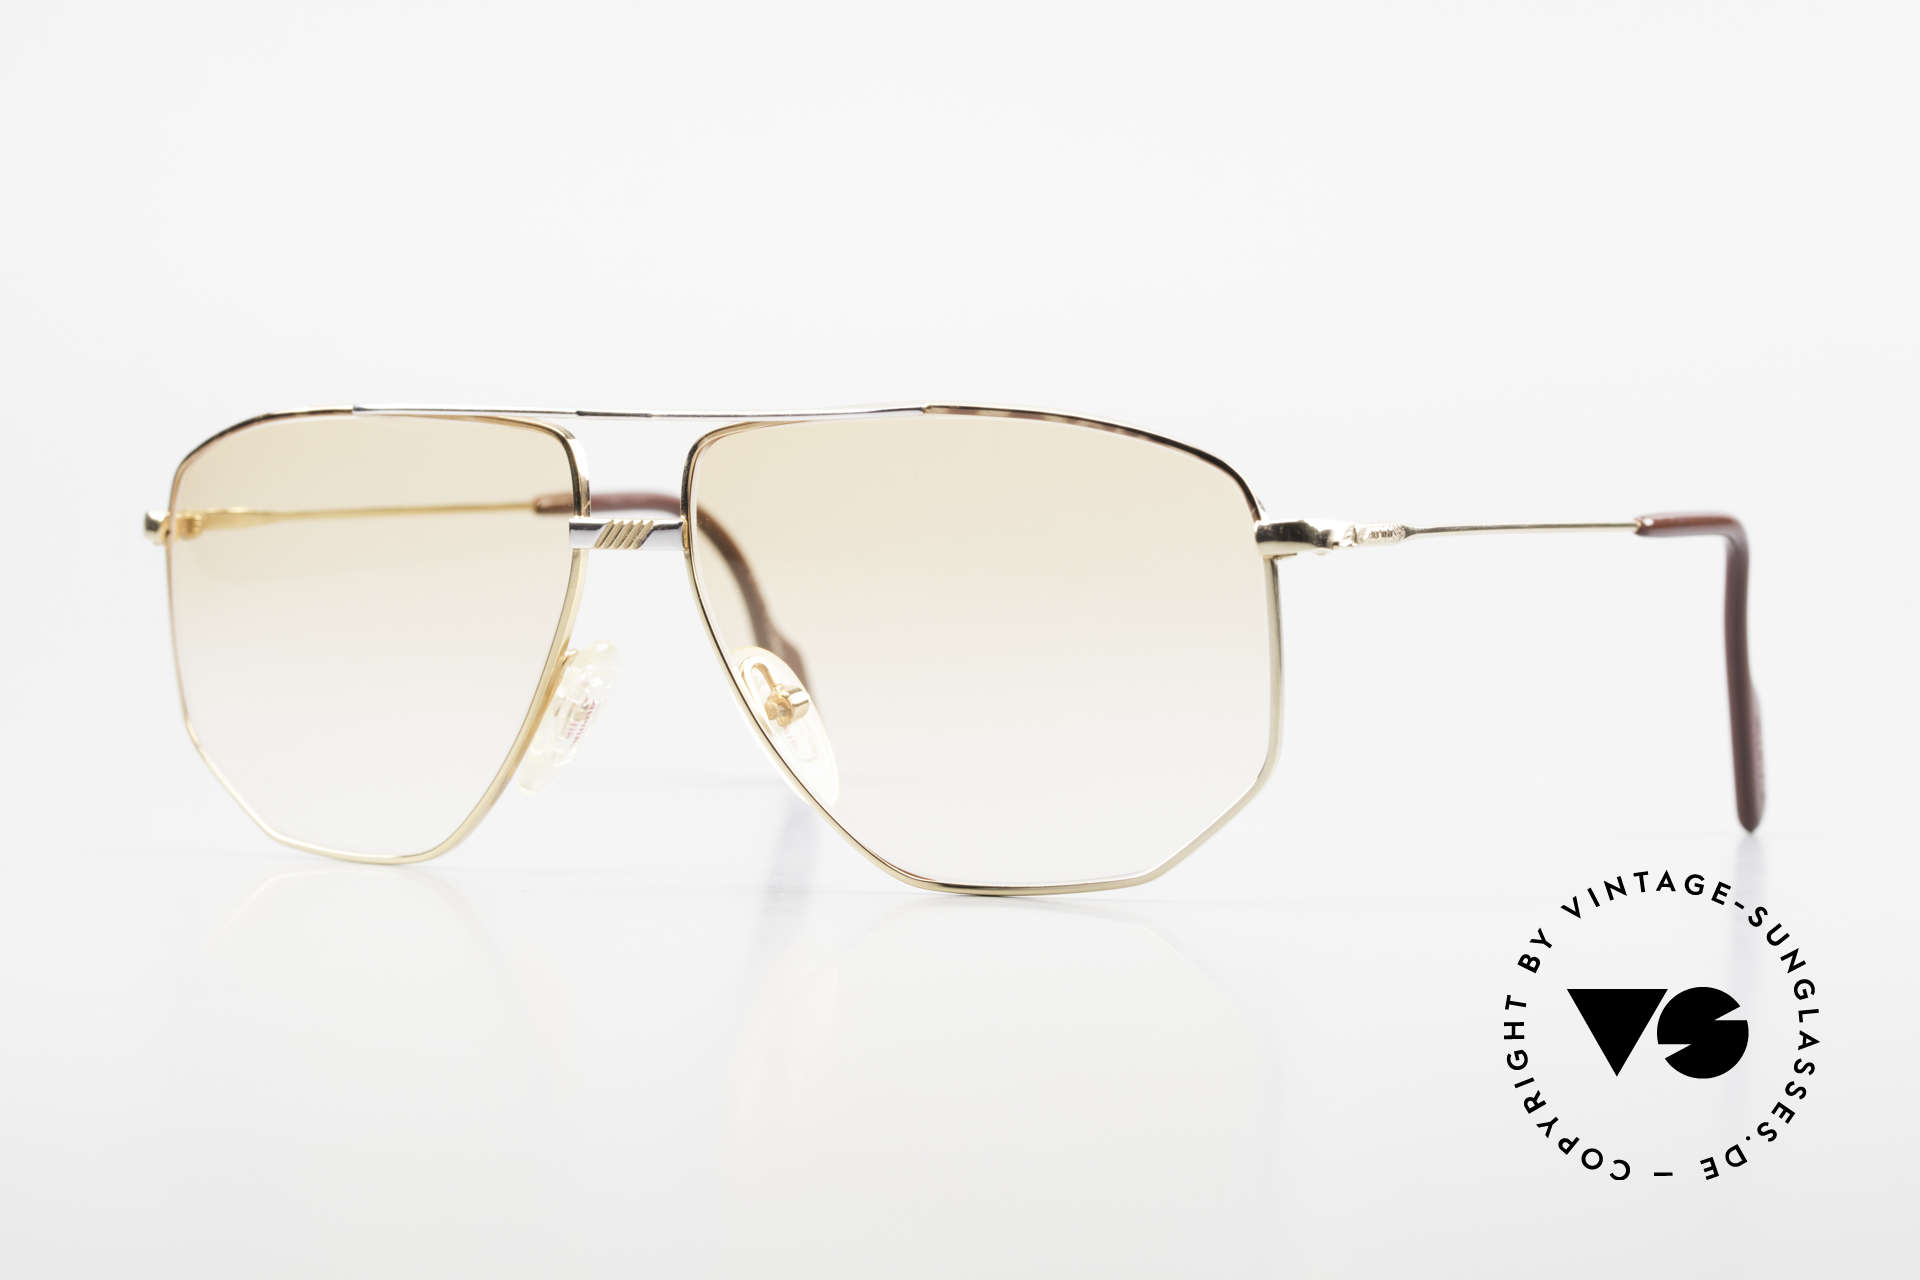 Alpina FM68 No Retro Glasses True Vintage, extraordinary vintage ALPINA sunglasses from 1987/88, Made for Men